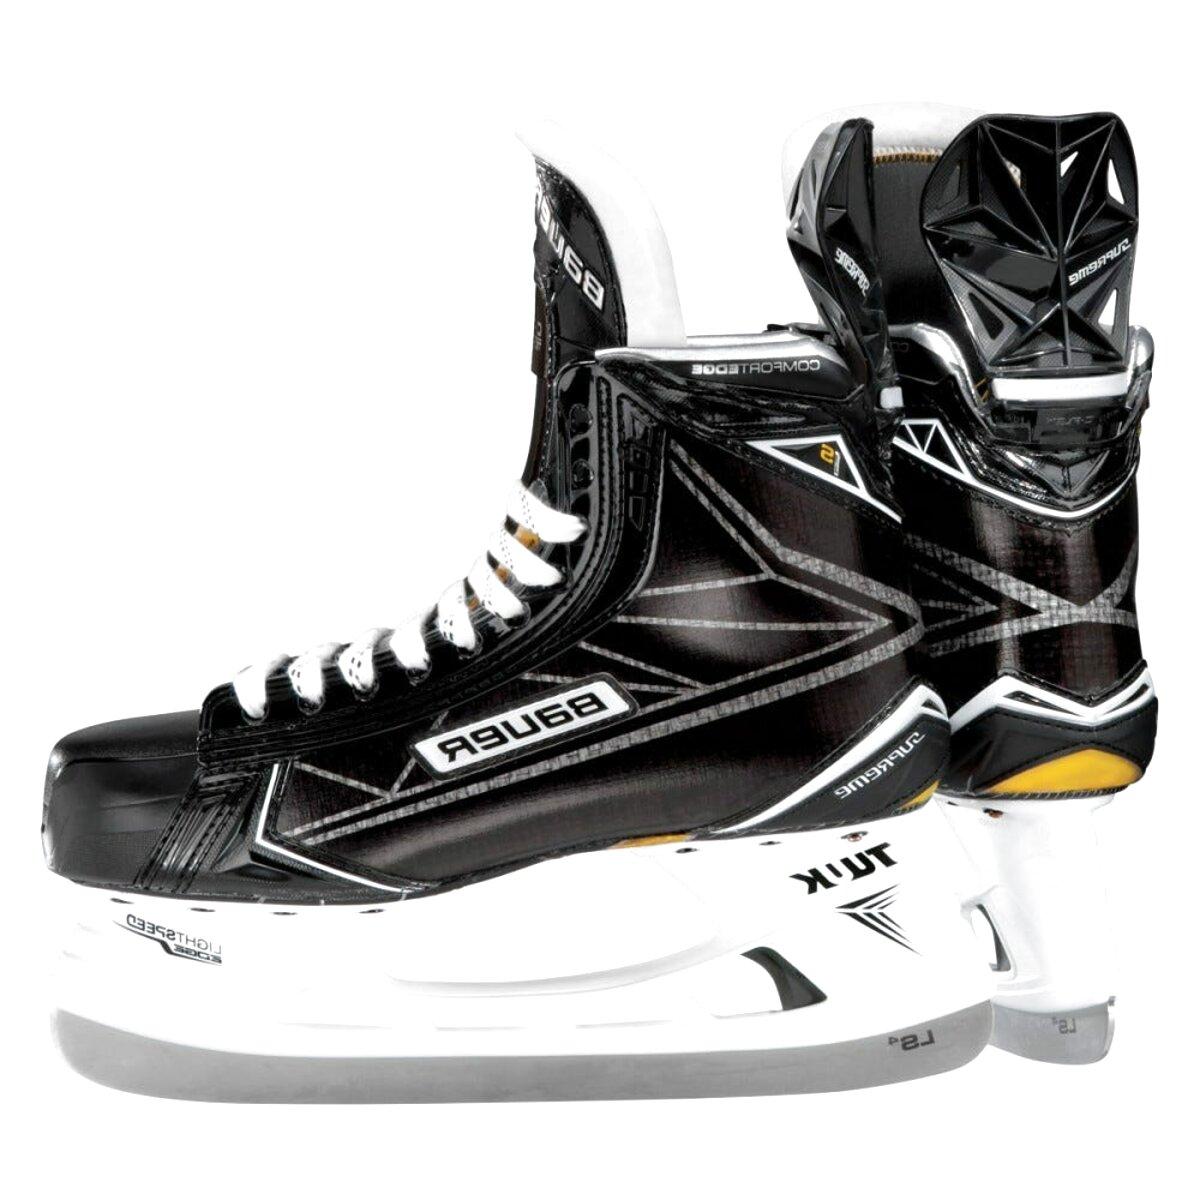 bauer 1s skates for sale